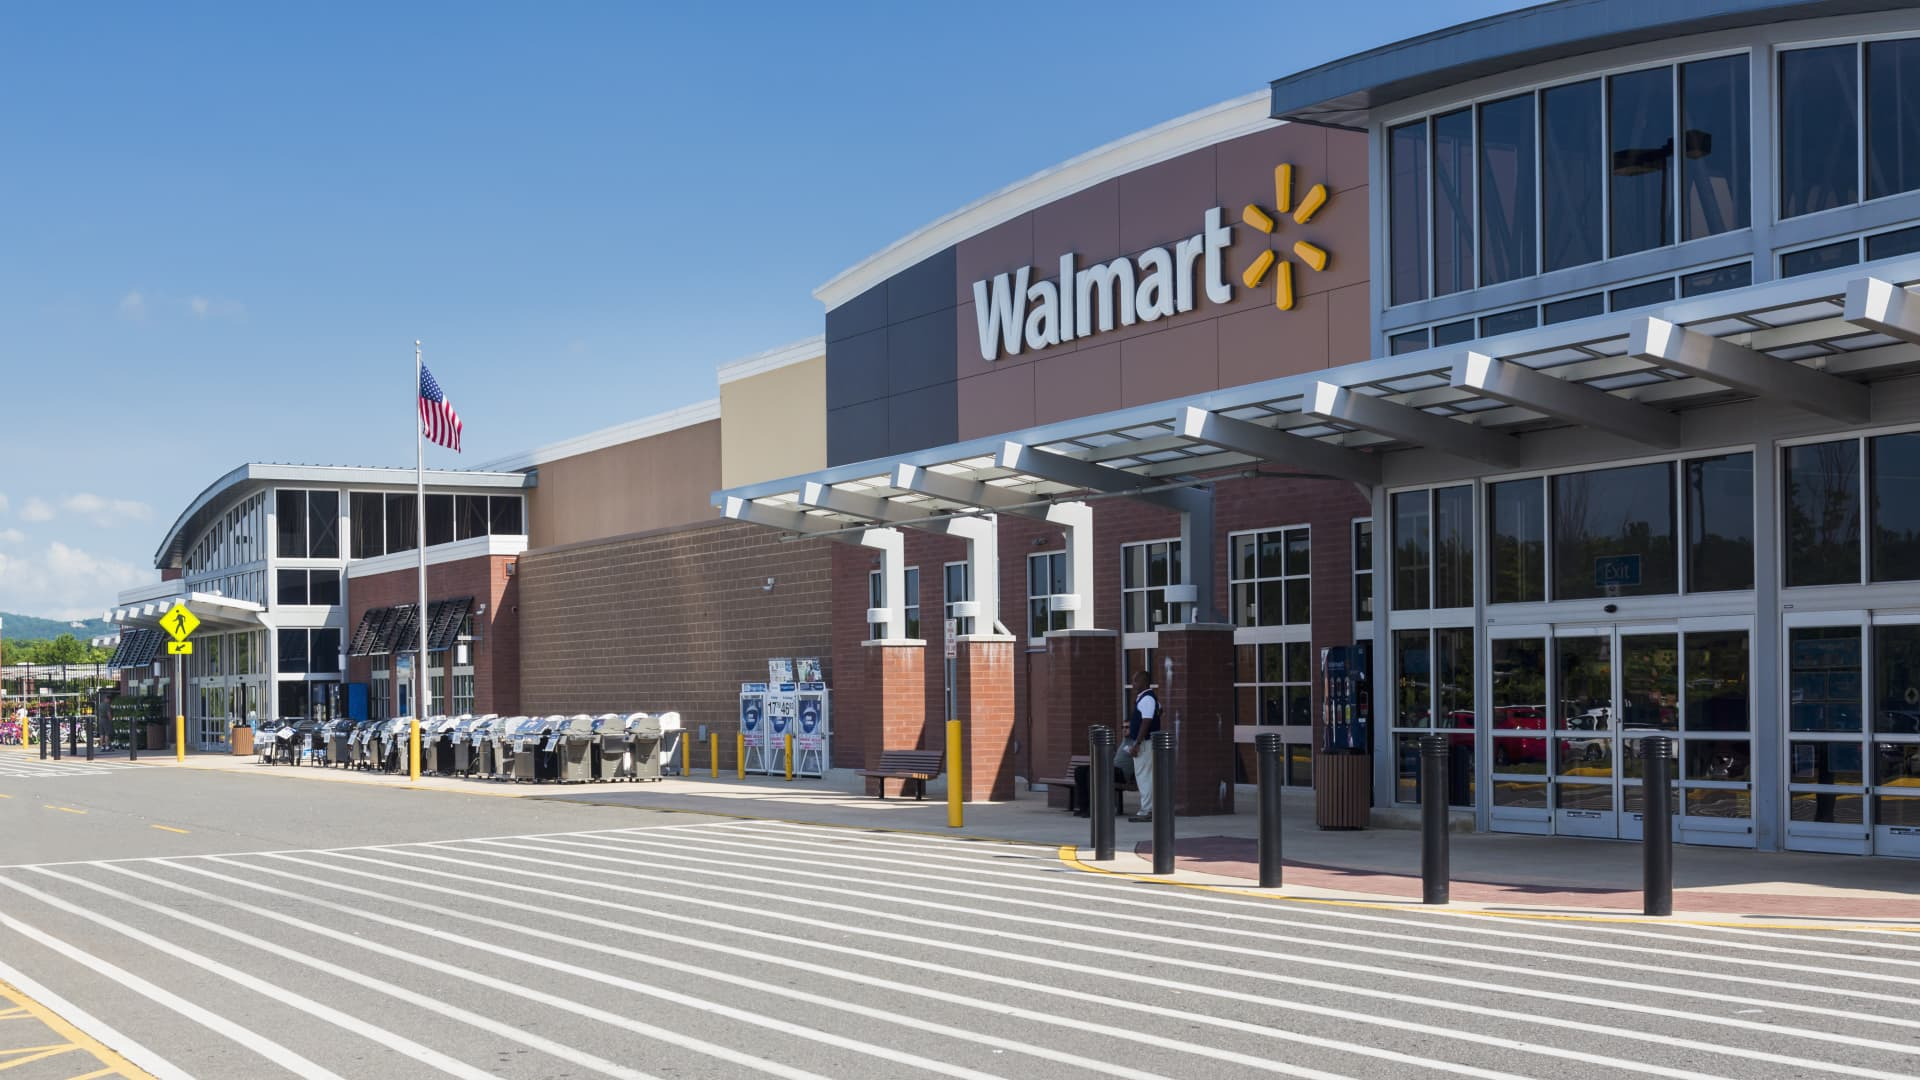 Walmart in Haymarket, Virginia, USA